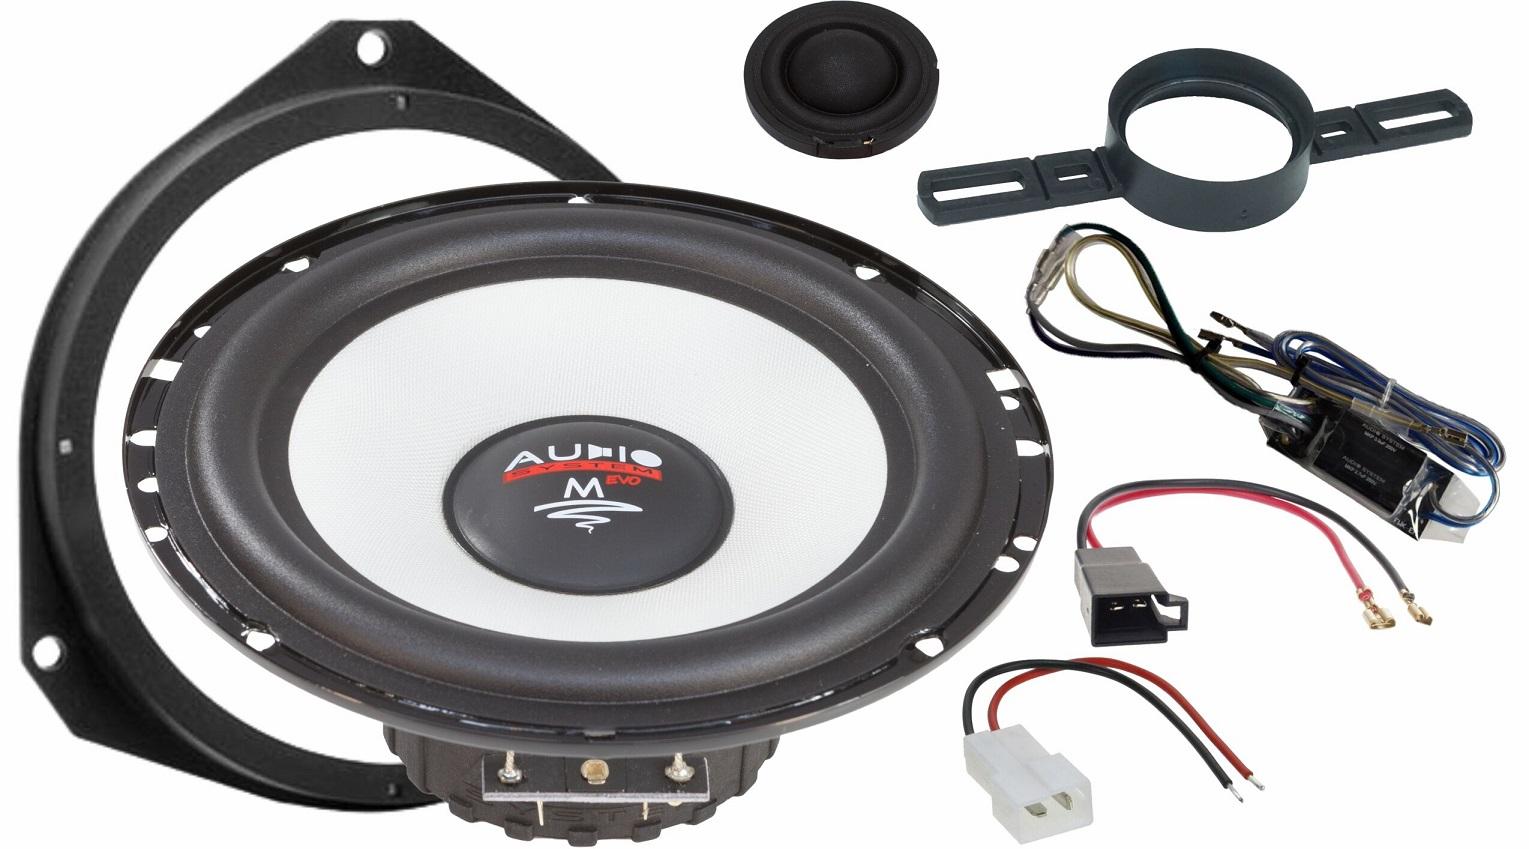 Audio System M 165 DUCATO EVO 2 FIAT DUCATO 2-Wege 16,5cm M-SERIES 2-Wege Spezial System